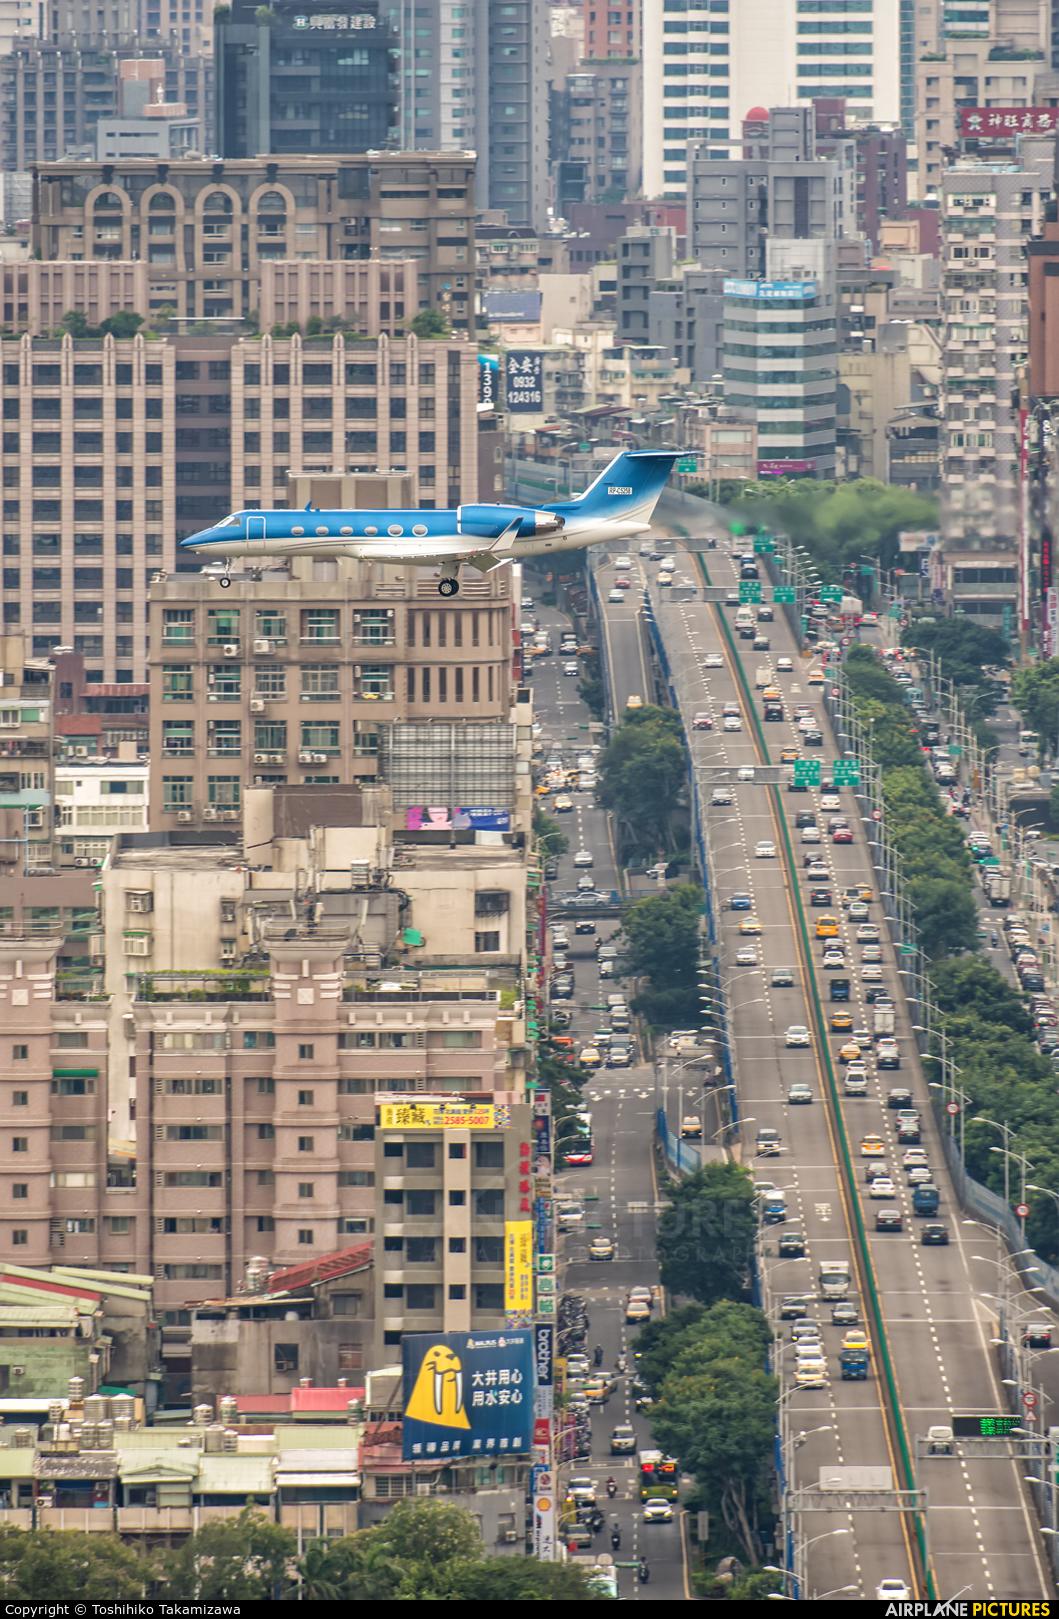 Platinum Skies Aviation RP-C5258 aircraft at Taipei - Sung Shan